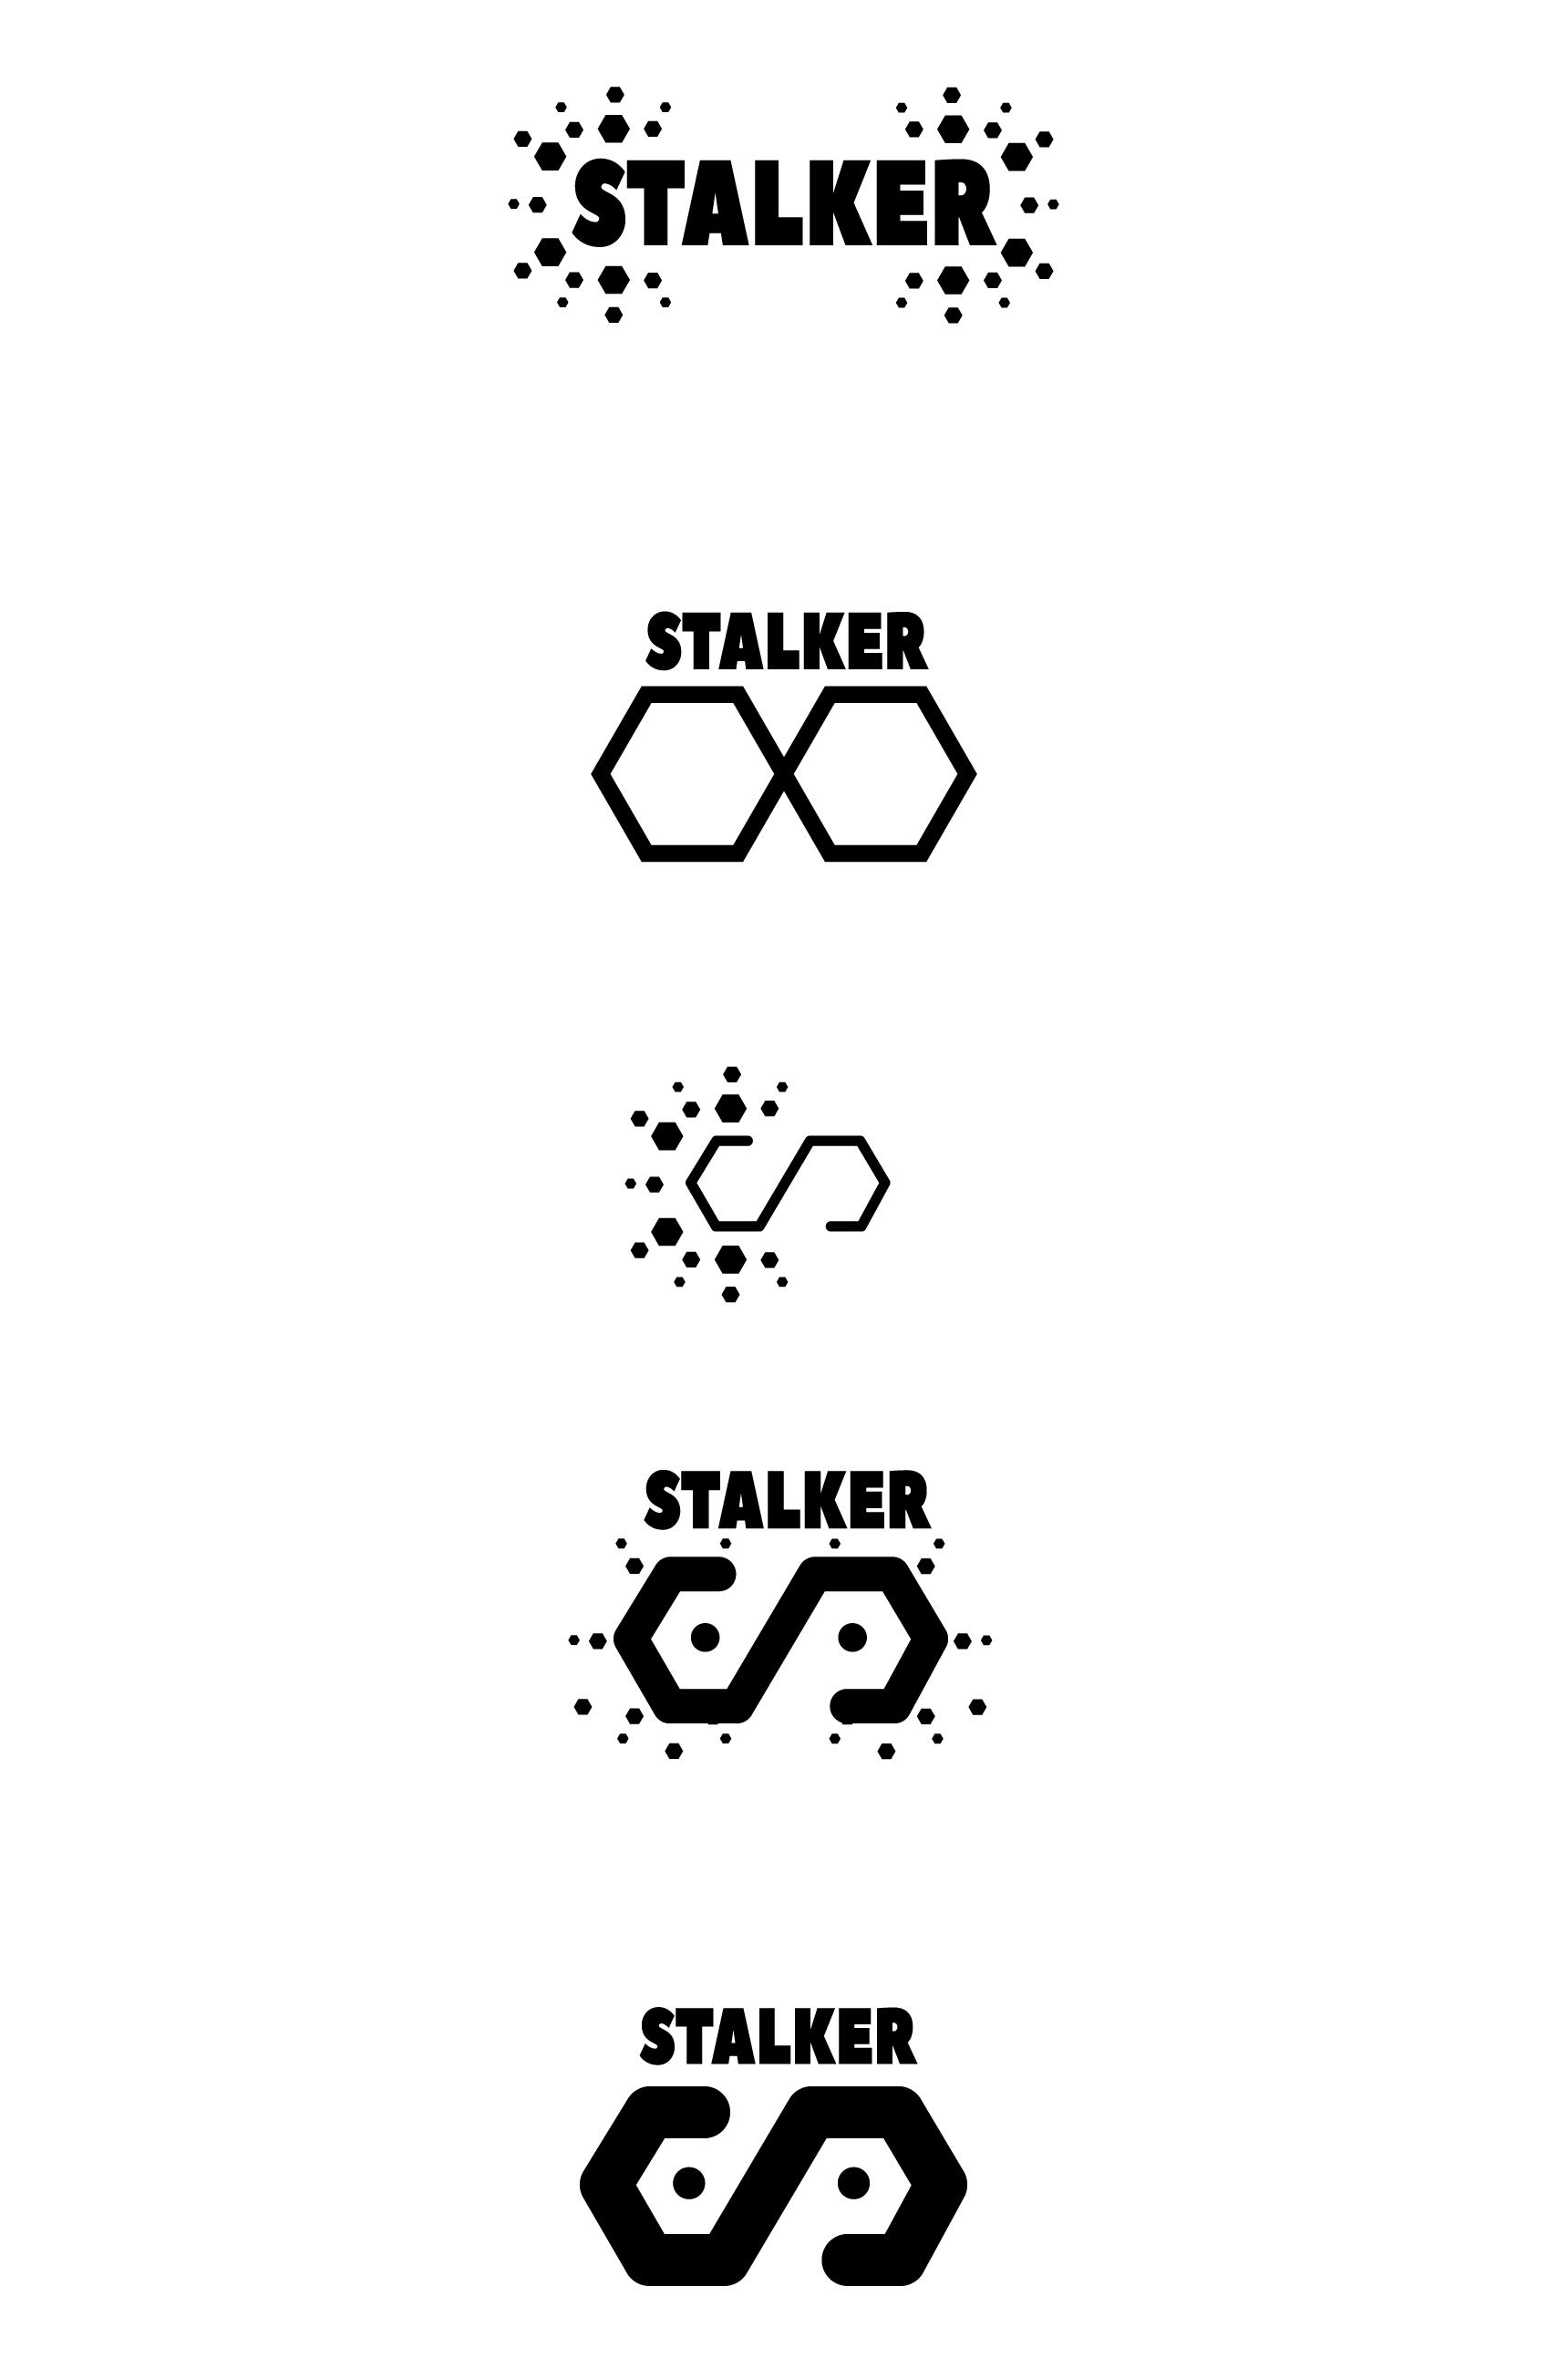 Разработать логотип для вездехода фото f_0475f889b7774aaa.jpg